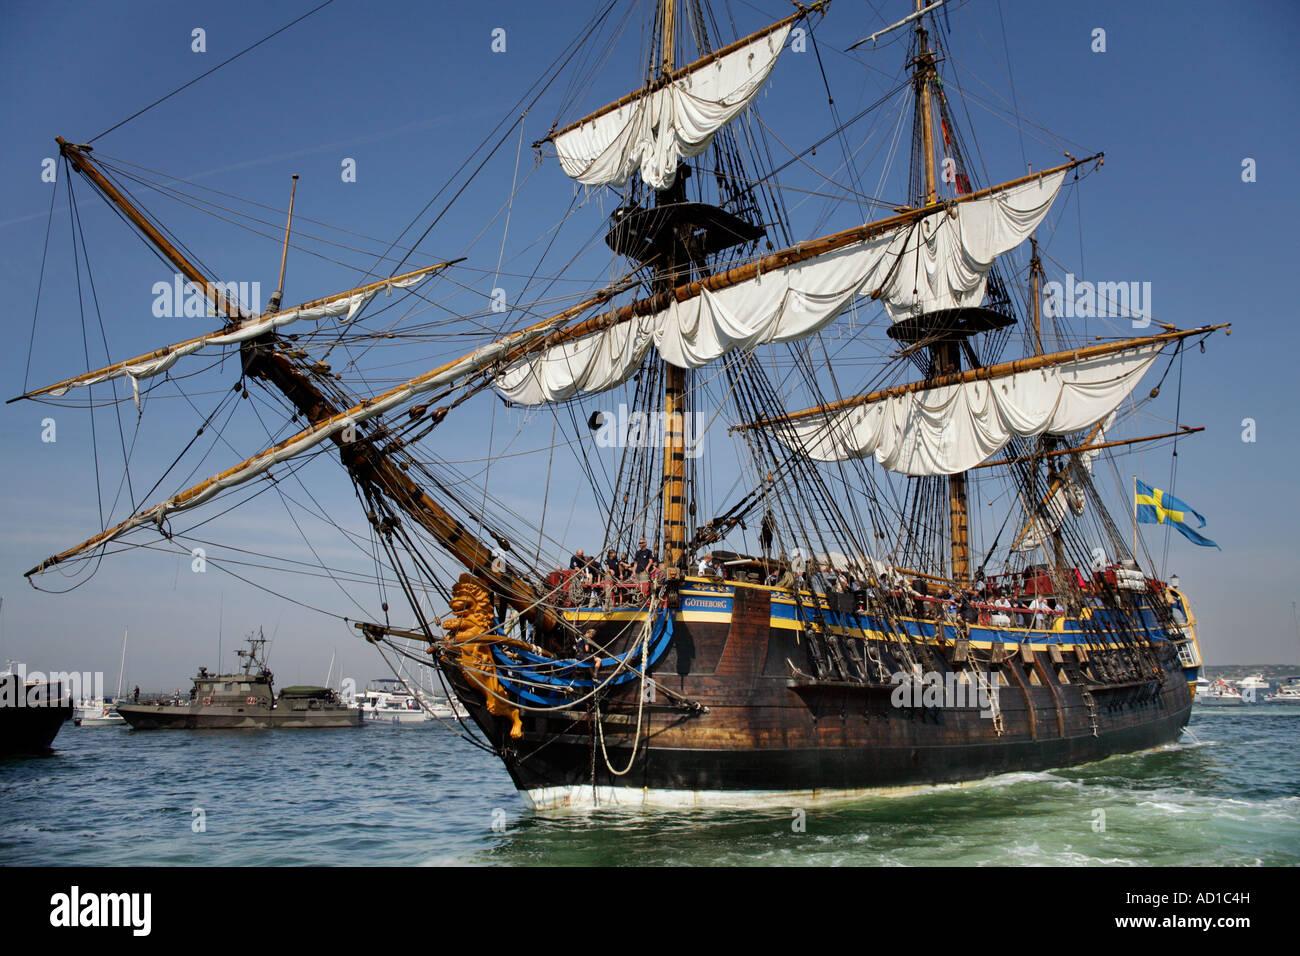 Replica of East Indiaman Gothenburg (Ostindiefararen Göteborg) back home on anchor in Gothenburg's estuary - Stock Image